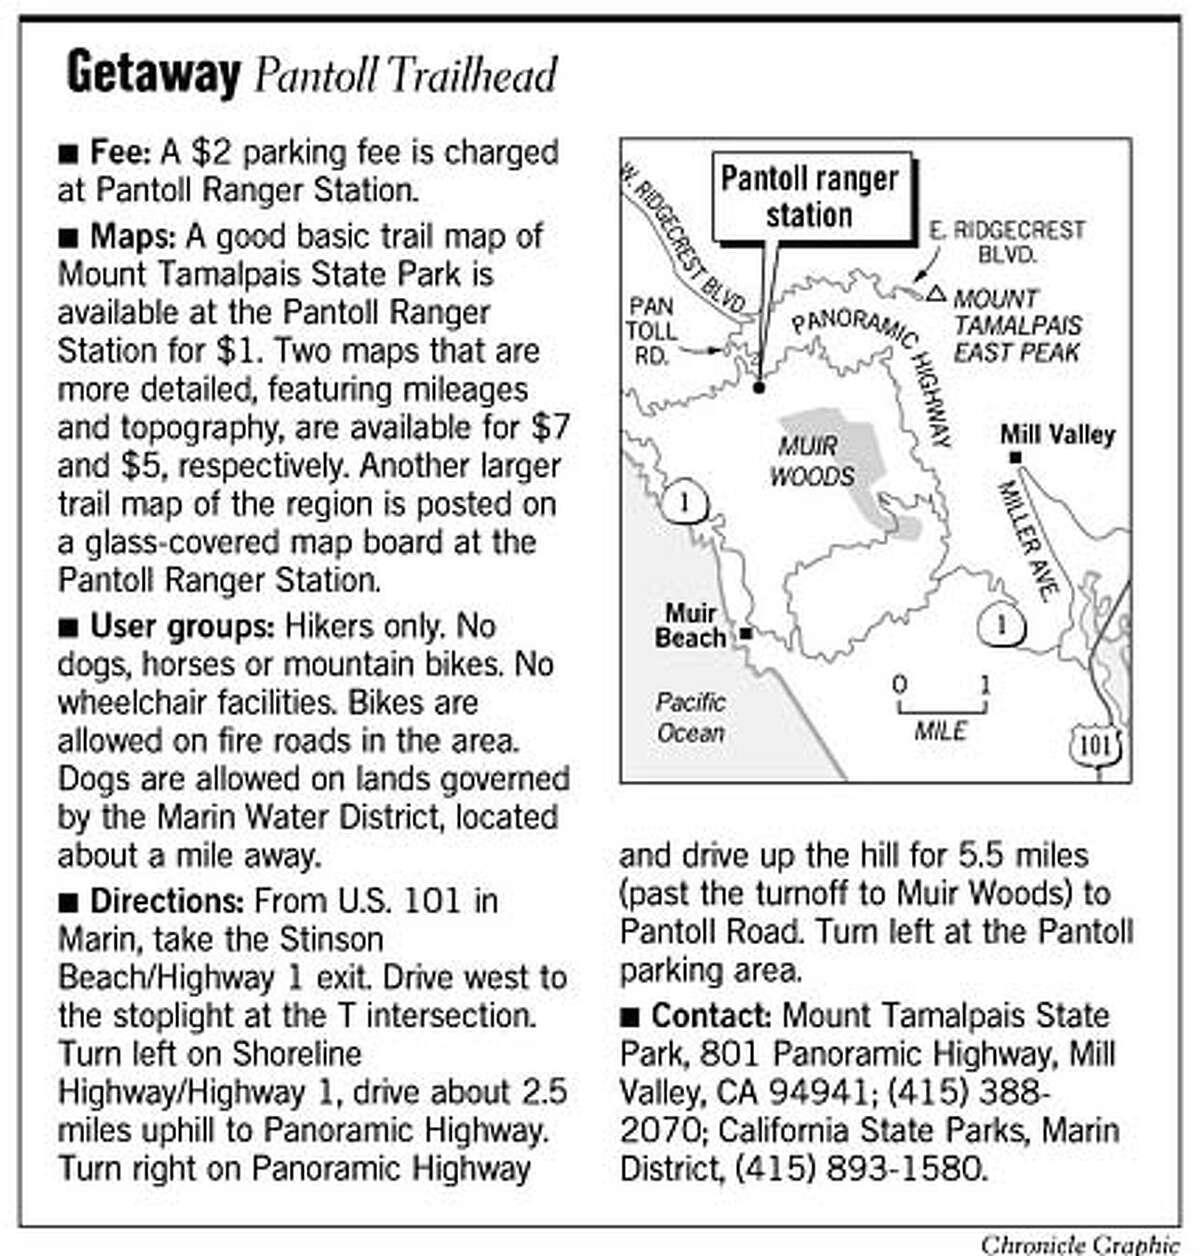 Getaway: Pantoll Trailhead. Chronicle Graphic